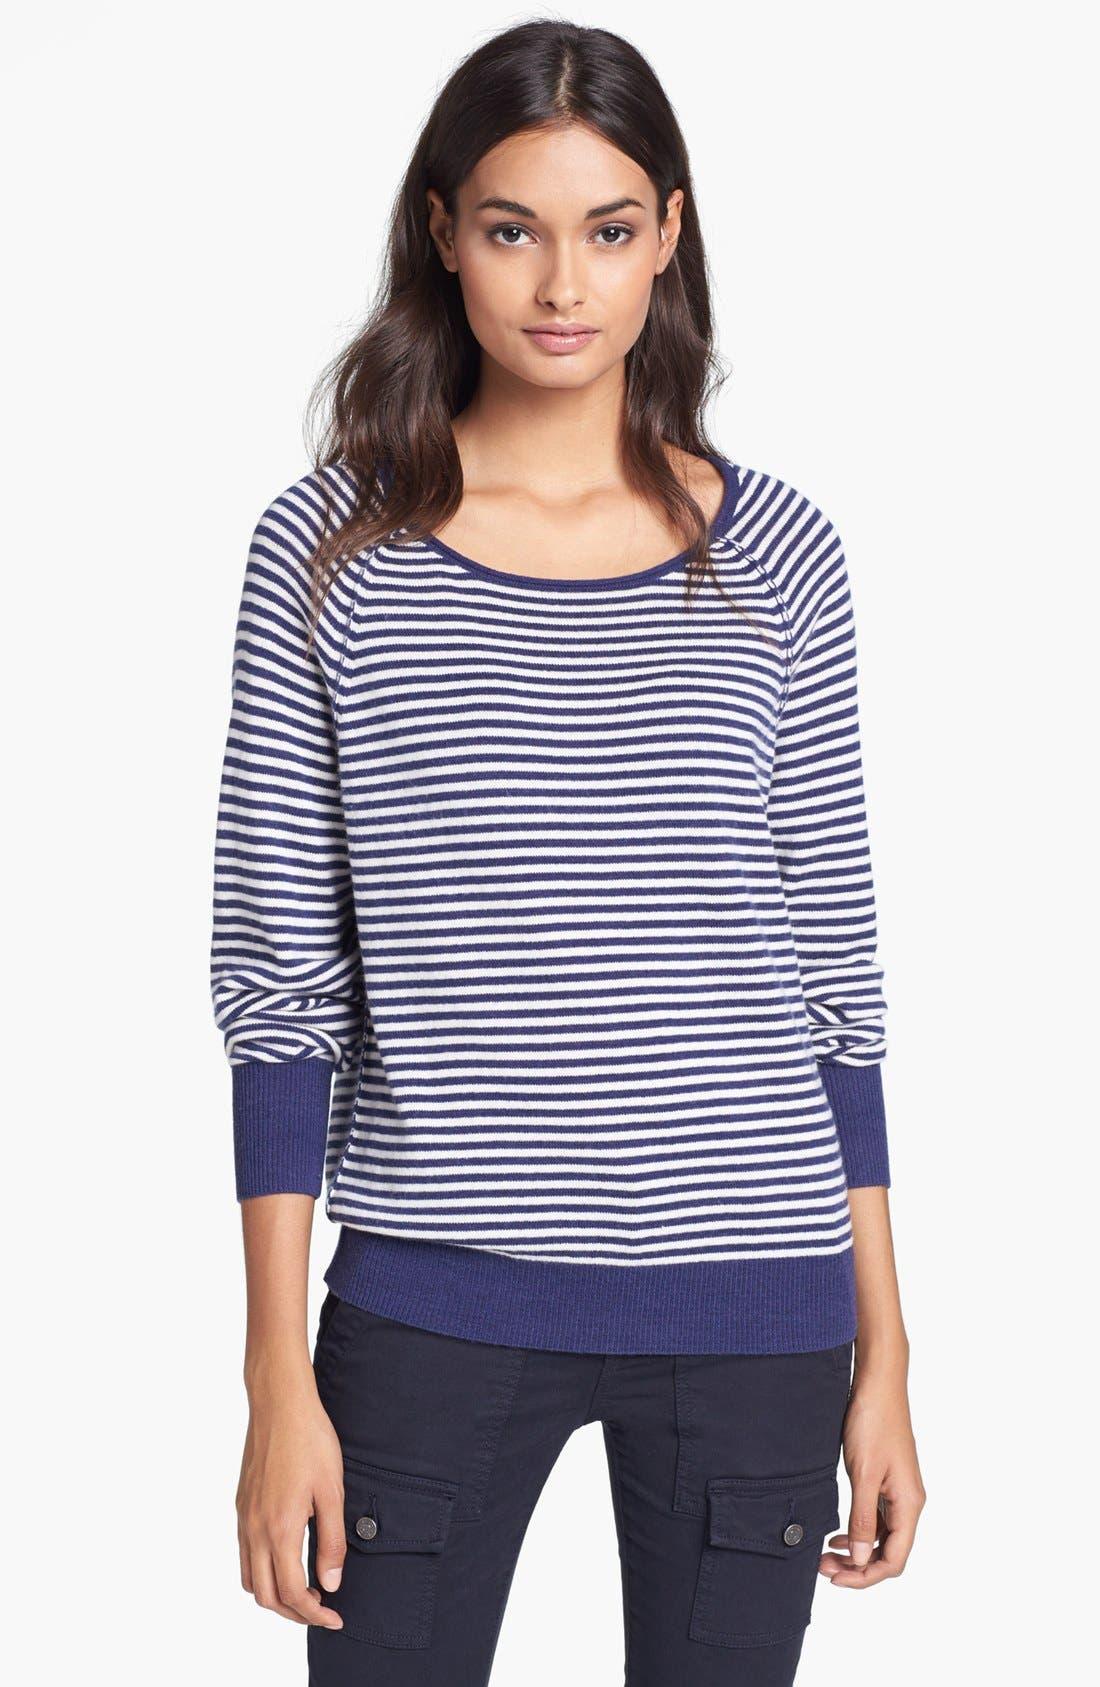 Main Image - Joie 'Tiana' Wool & Cashmere Sweater